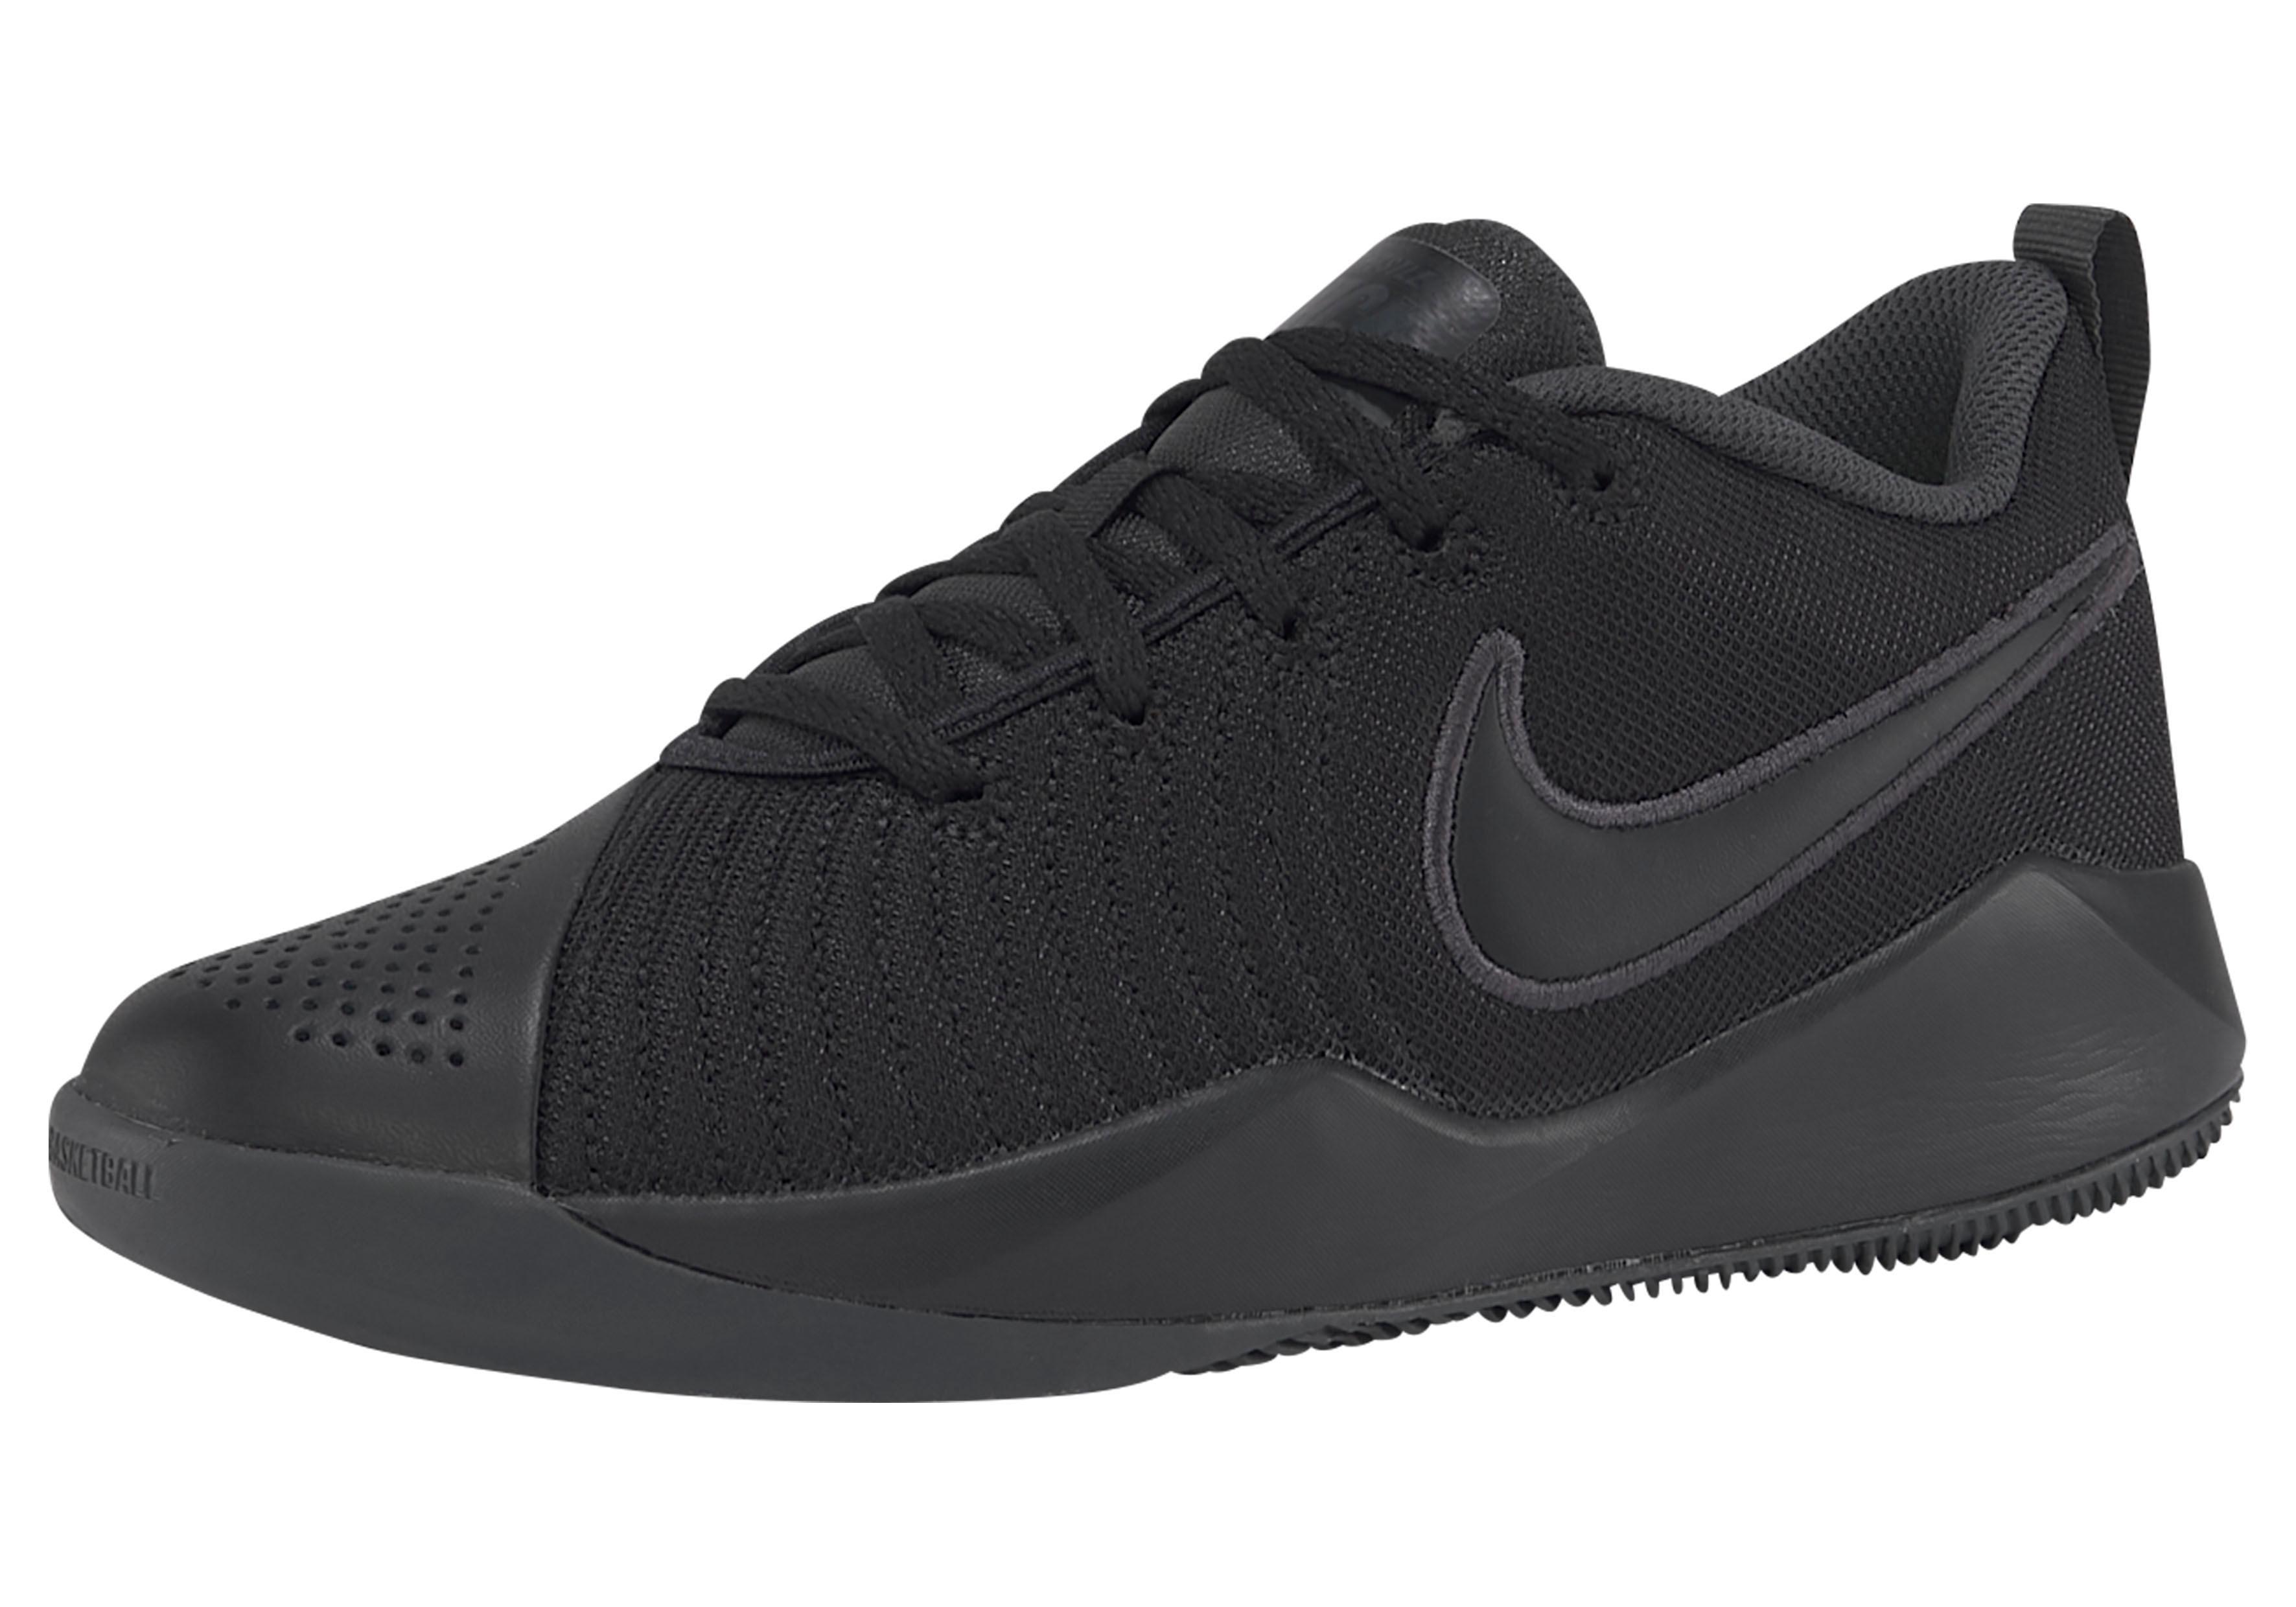 Nike Basketballschuh Team Hustle Quick 2 (gs) | Schuhe > Sportschuhe > Basketballschuhe | Schwarz | Nike